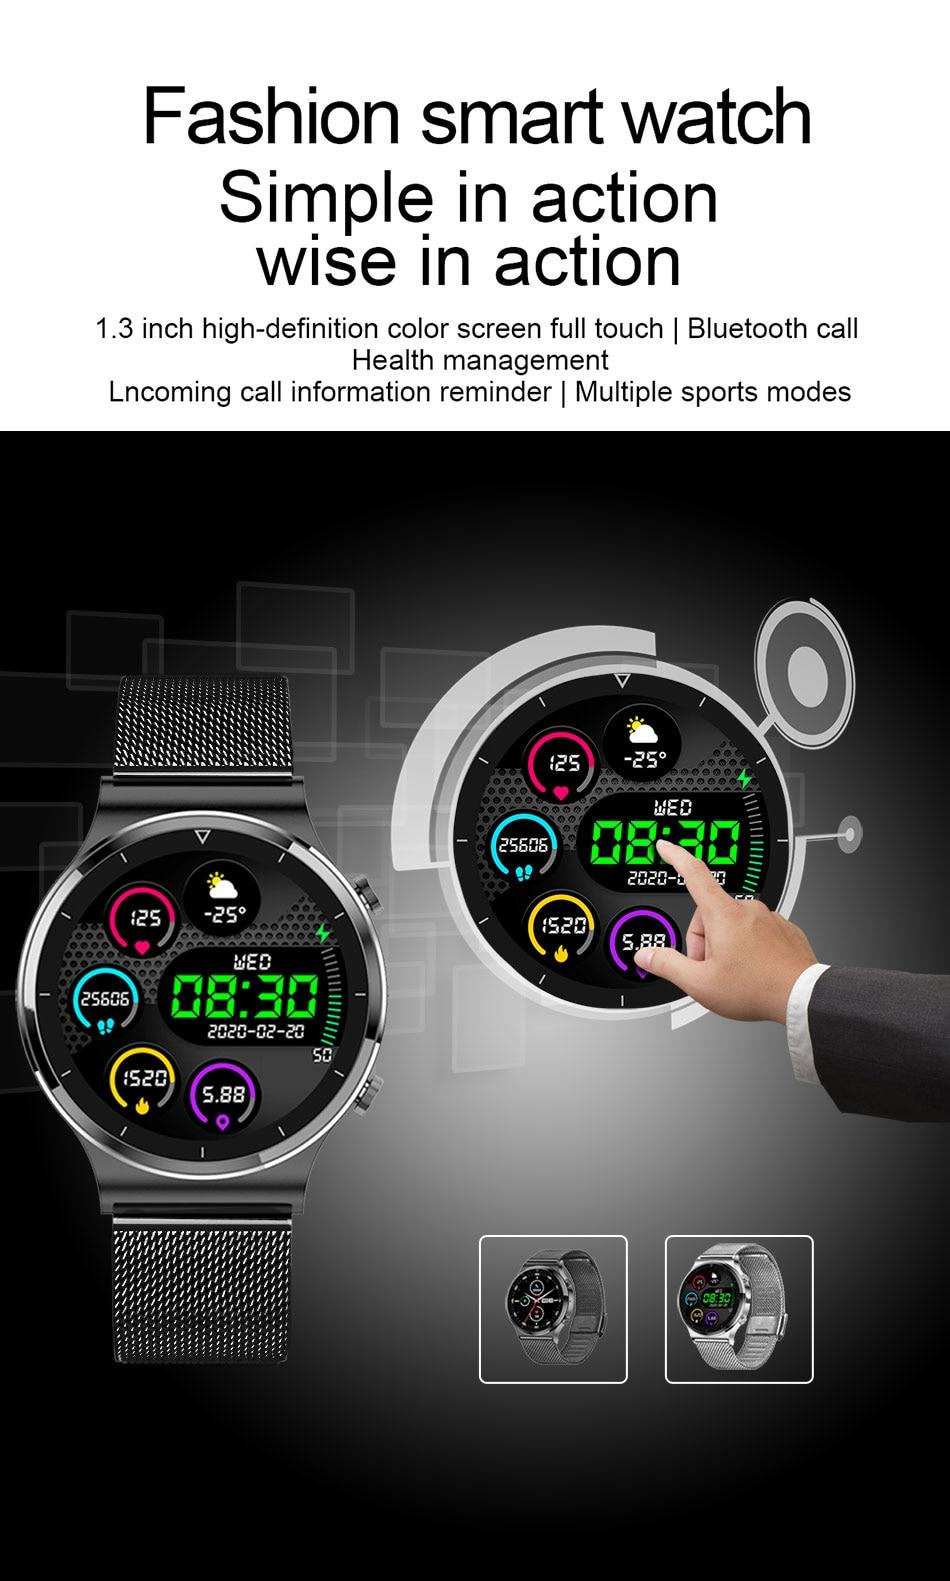 Hb804c7342cf34cd6b30d1b5c0a427201O LIGE 2021 New Smart watch Men IP68 waterproof watch Multiple sports modes heart rate weather Forecast Bluetooth Men Smart watch